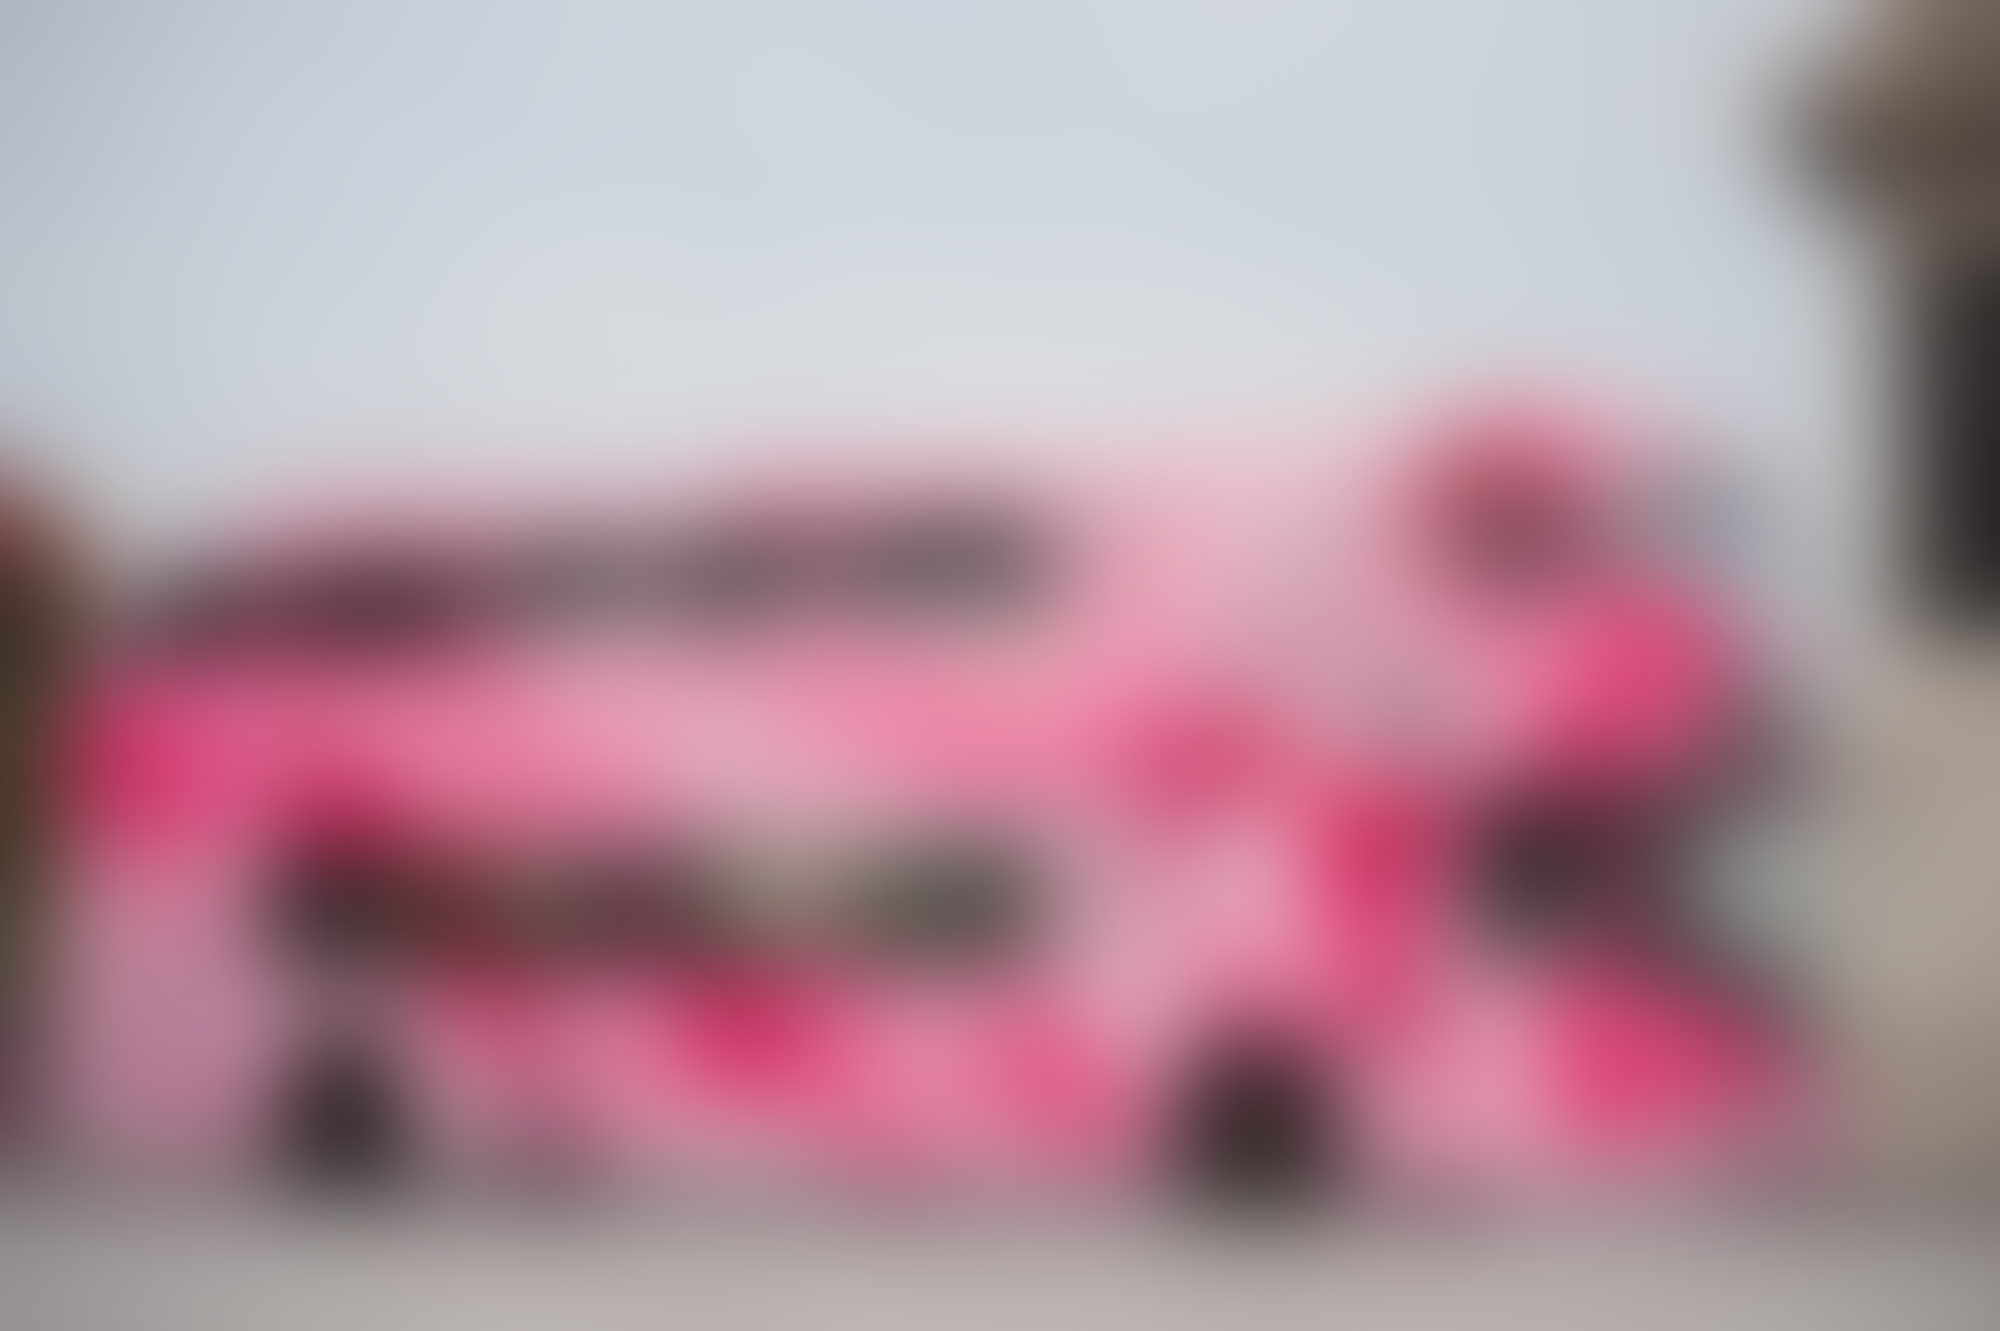 Deliveroo LIP 7 autocompressfitresizeixlibphp 1 1 0max h2000max w3 D2000q80sf97771e613b8ca02cd44e3c7bcd14803